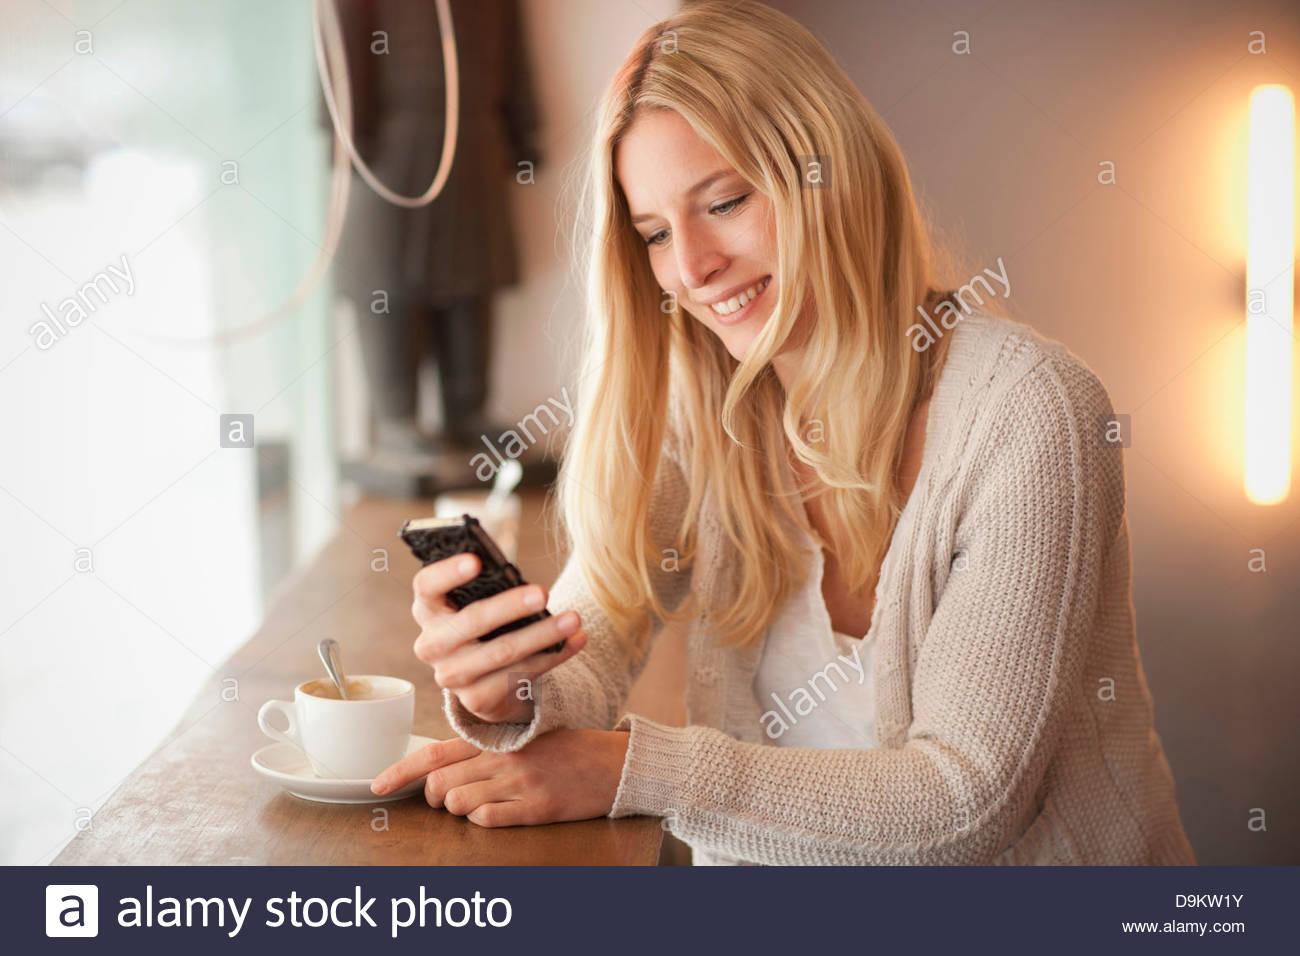 Junge Frau mit Handy im café Stockbild